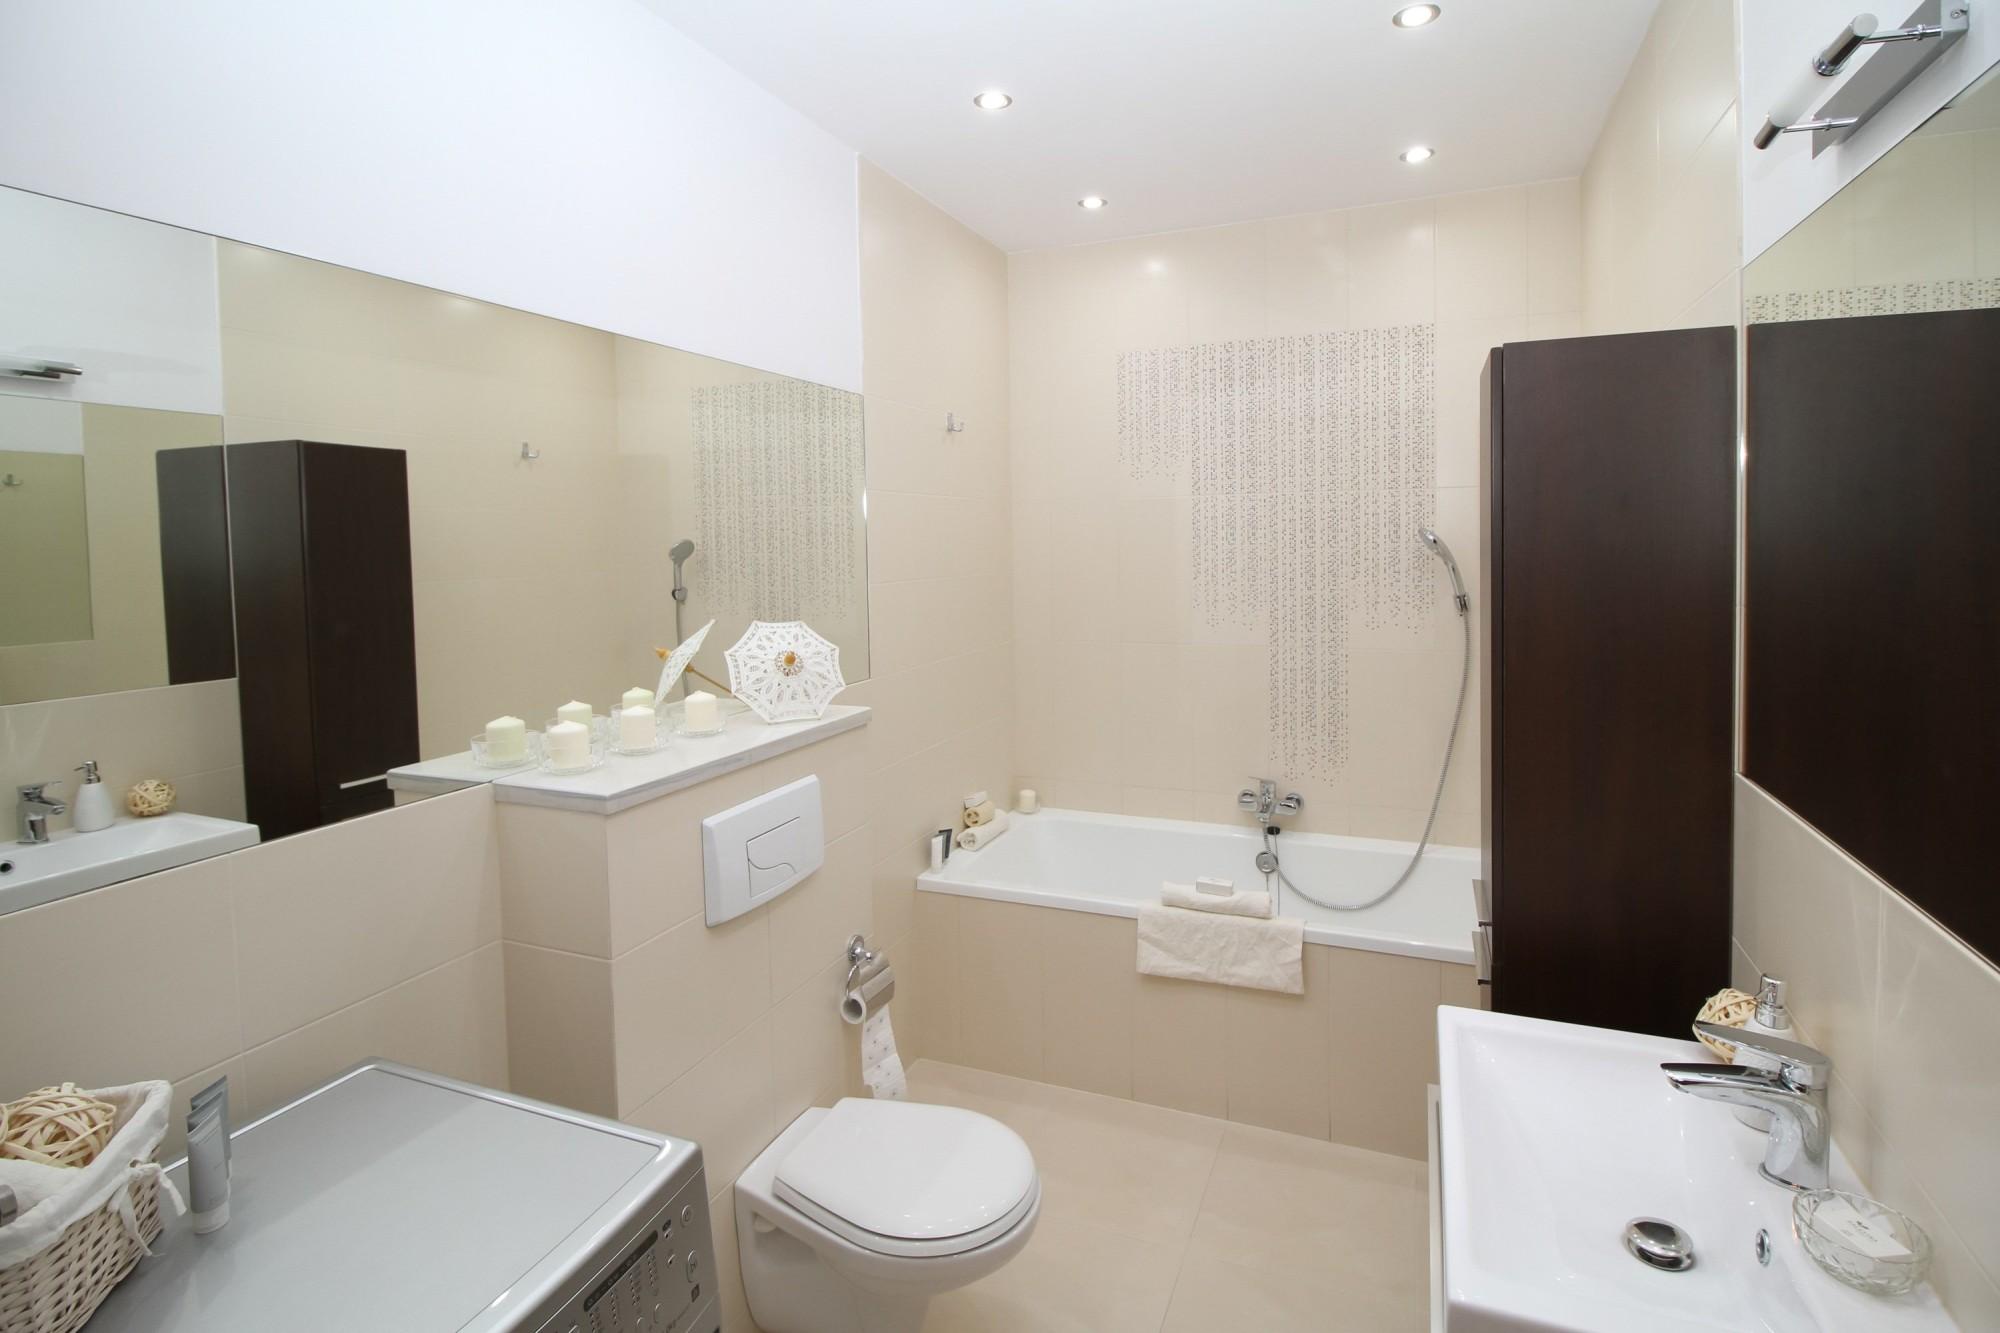 Beautiful Bathroom: 13 Awesome Bathroom Decor Ideas on a Budget